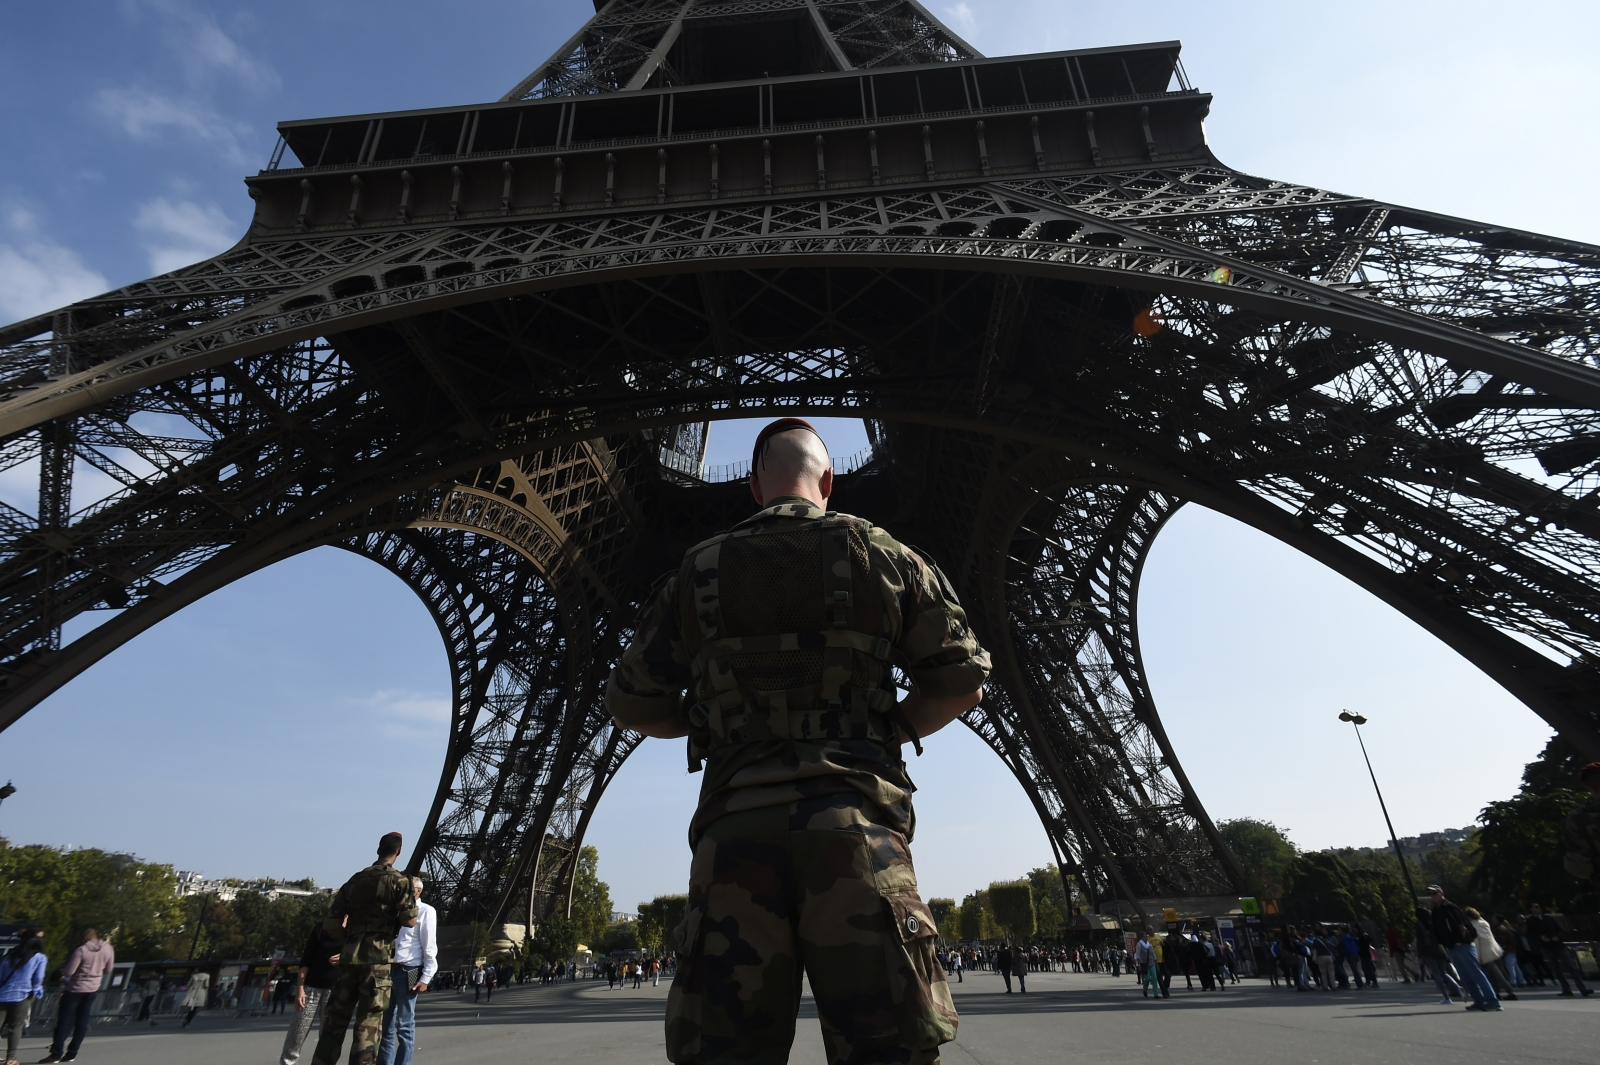 French soldier Eiffel tower paris